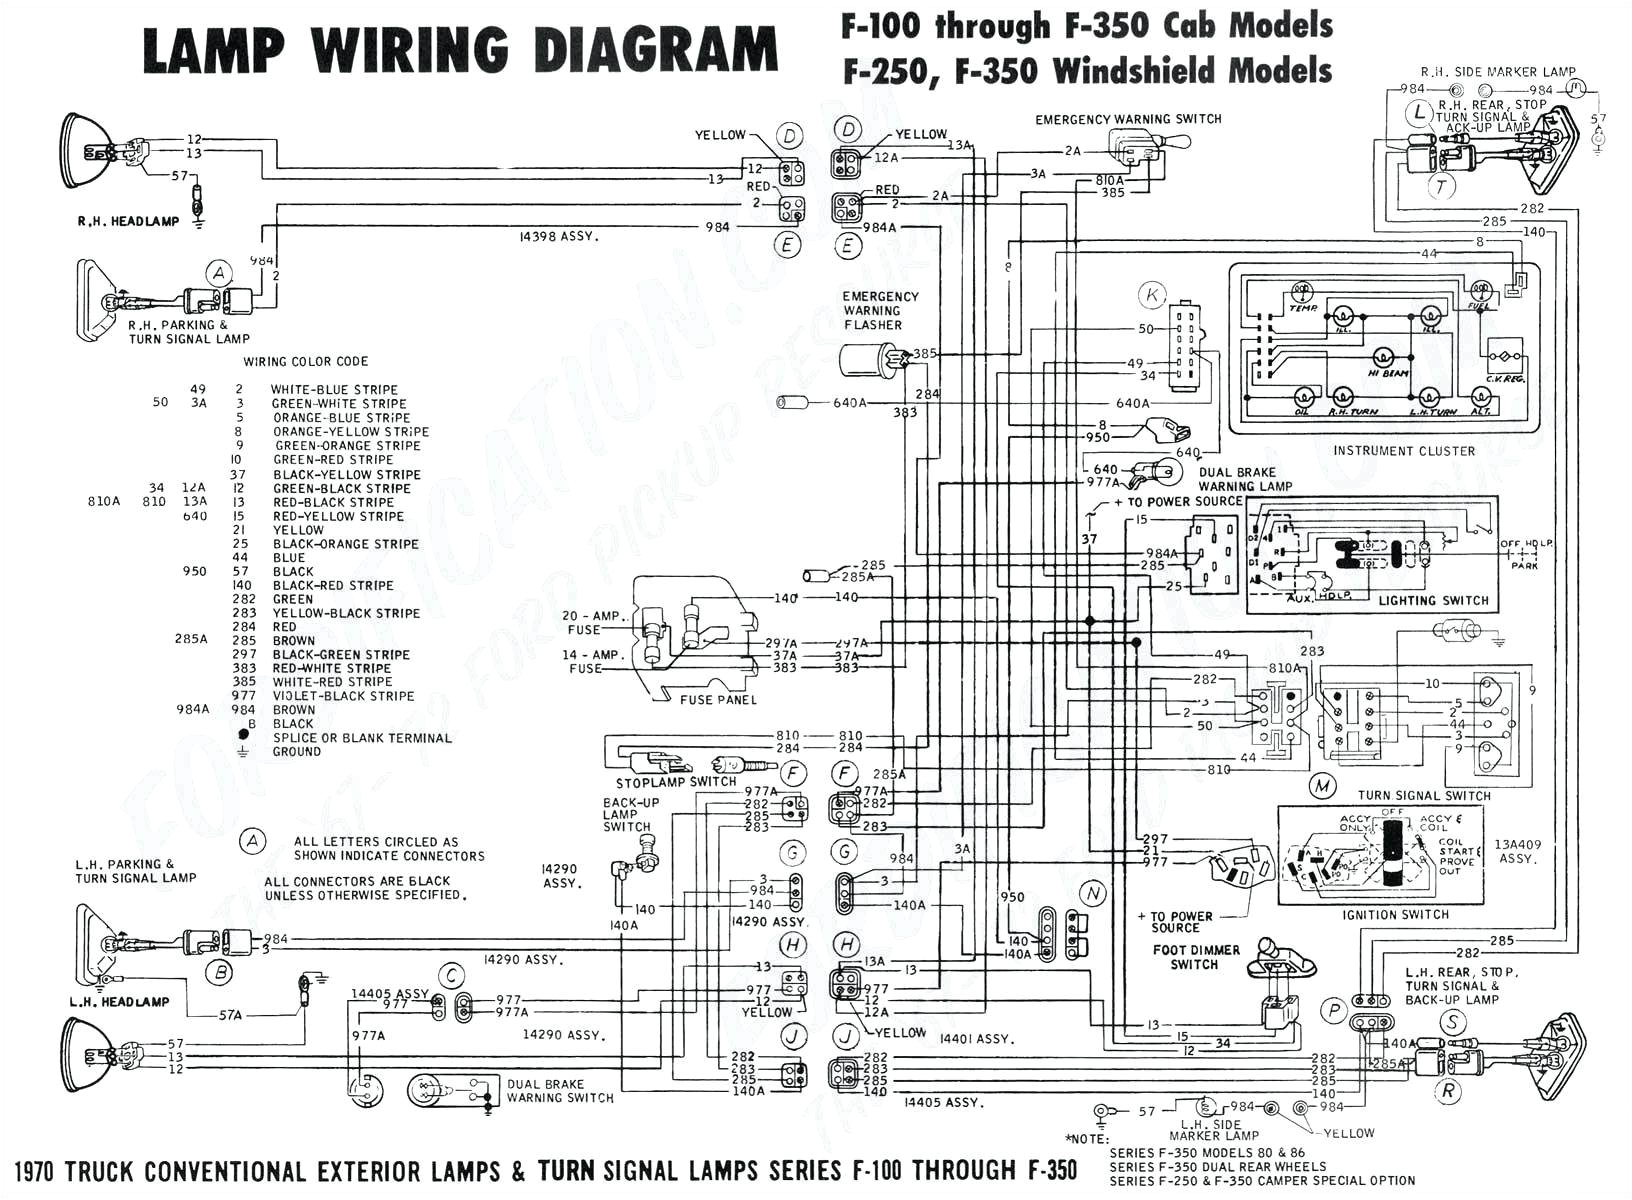 dodge ram 1500 fuel tank diagram furthermore electrical legend 1987 toyota pickup fuel tank diagram moreover 2005 dodge ram 1500 fuse